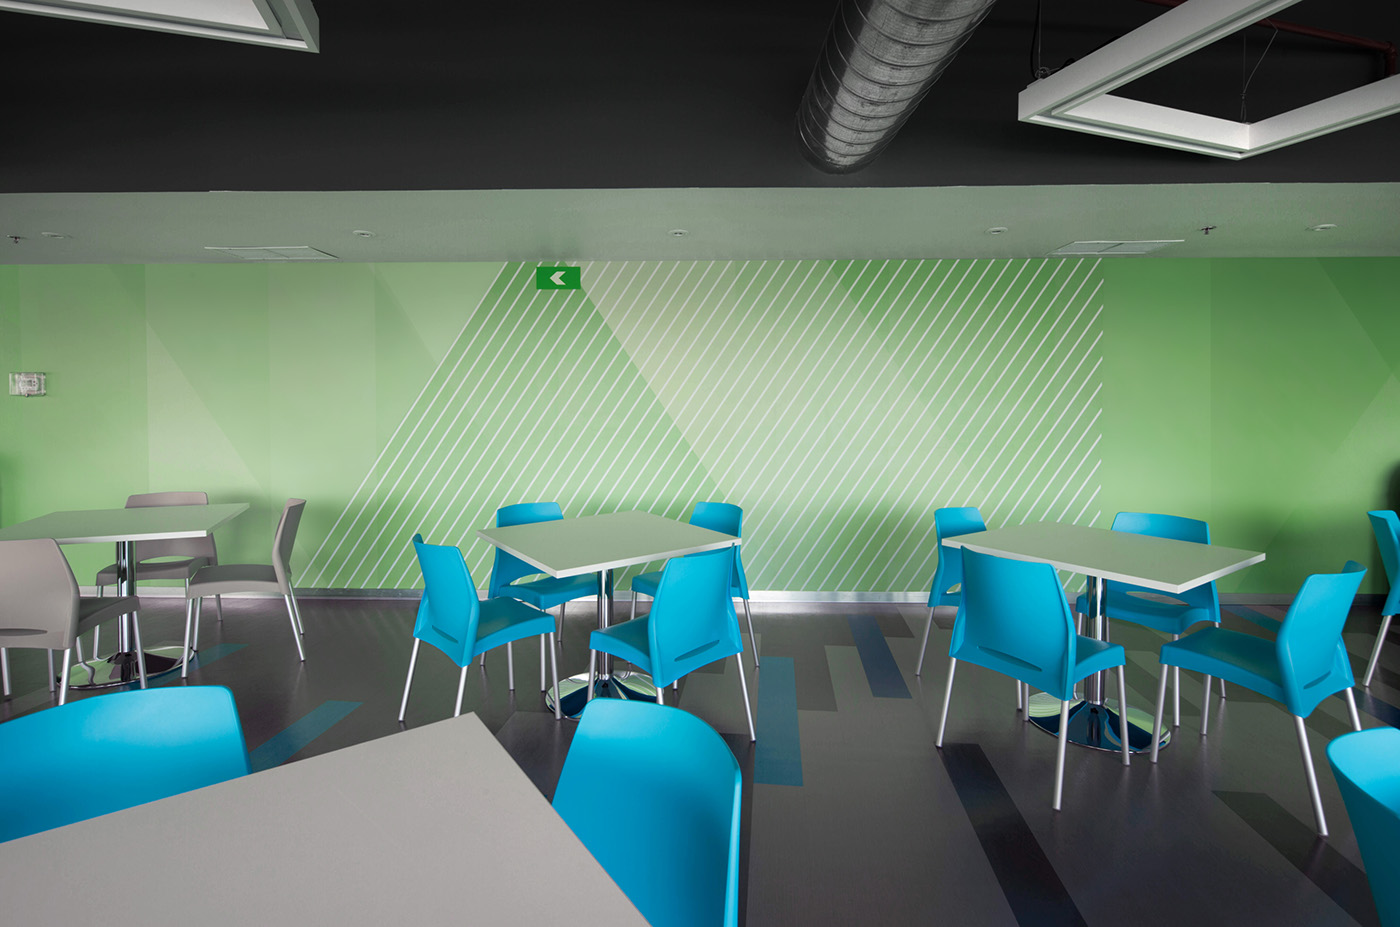 Softtek墨西哥办公室环境图形设计和标牌设计 © Pentágono Estudio